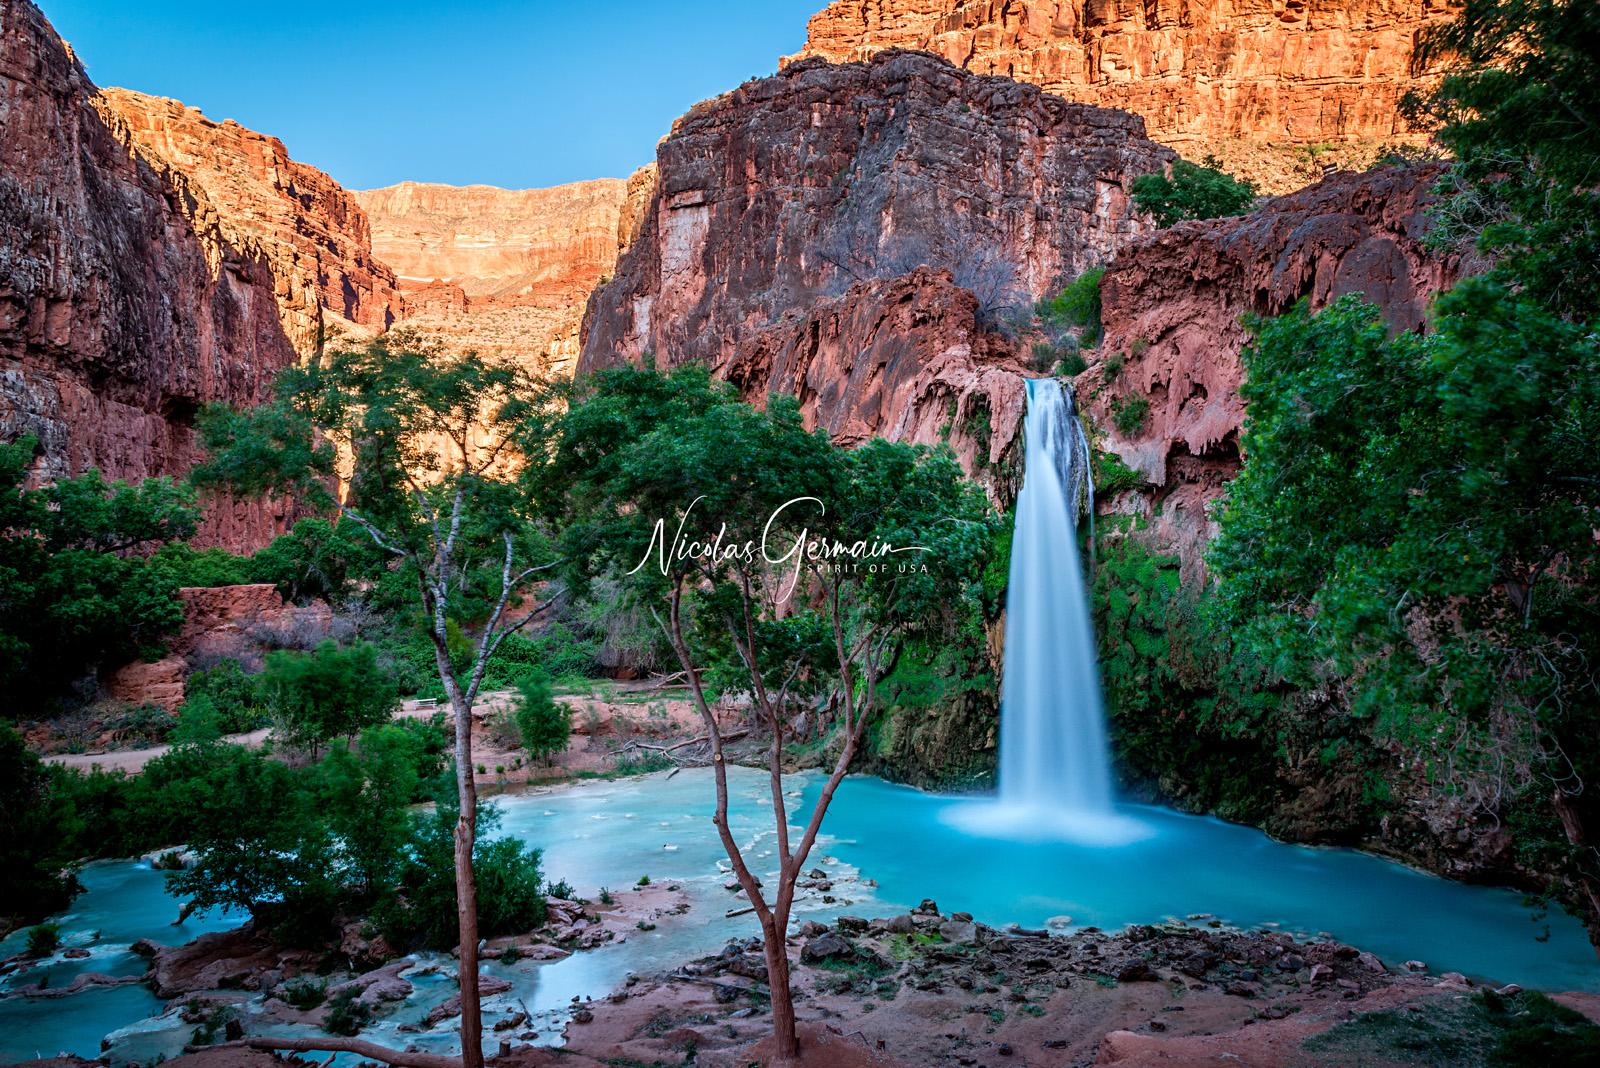 Havasu Falls - Nicolas Germain, Spirit of USA